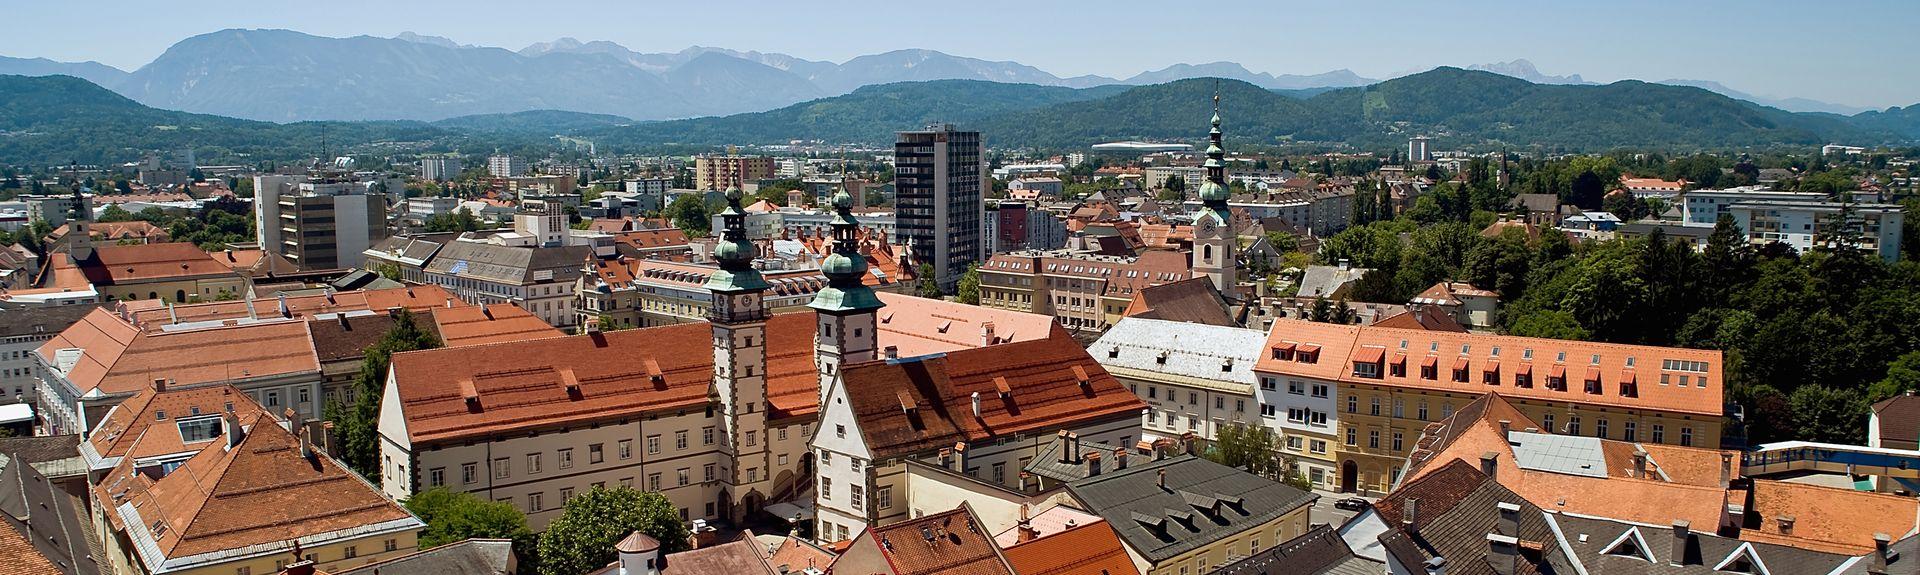 Kärnten, Itävalta